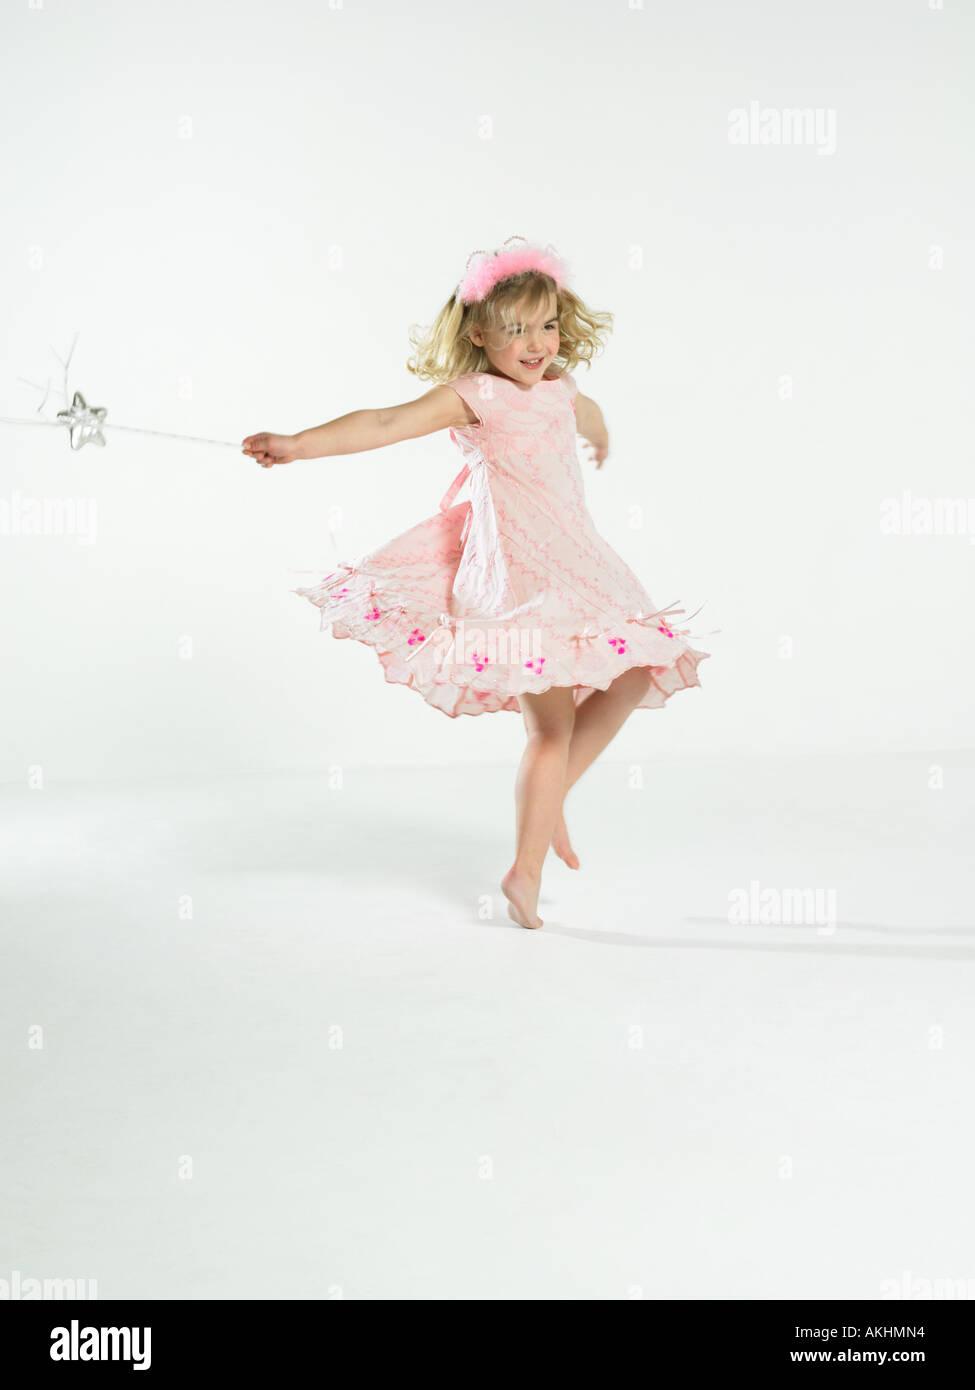 Mädchen mit Fee Zauberstab Stockbild